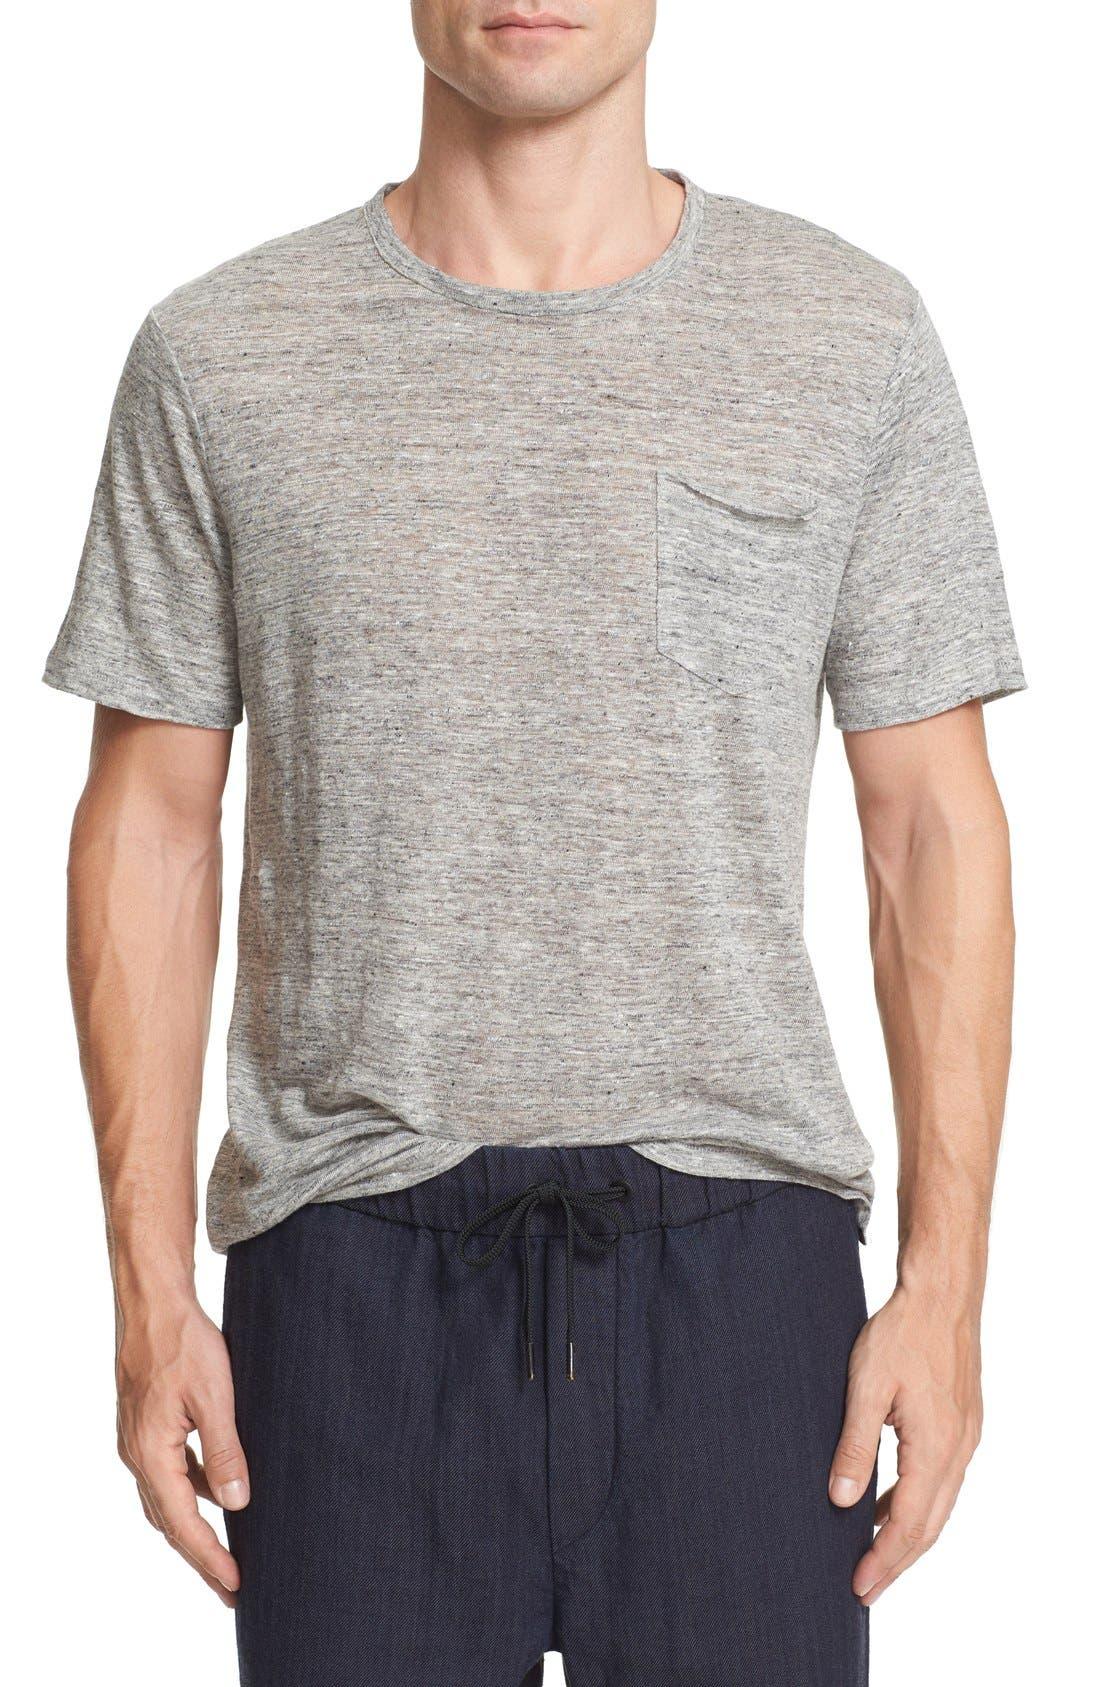 Owen Slub Linen T-Shirt,                             Main thumbnail 1, color,                             020